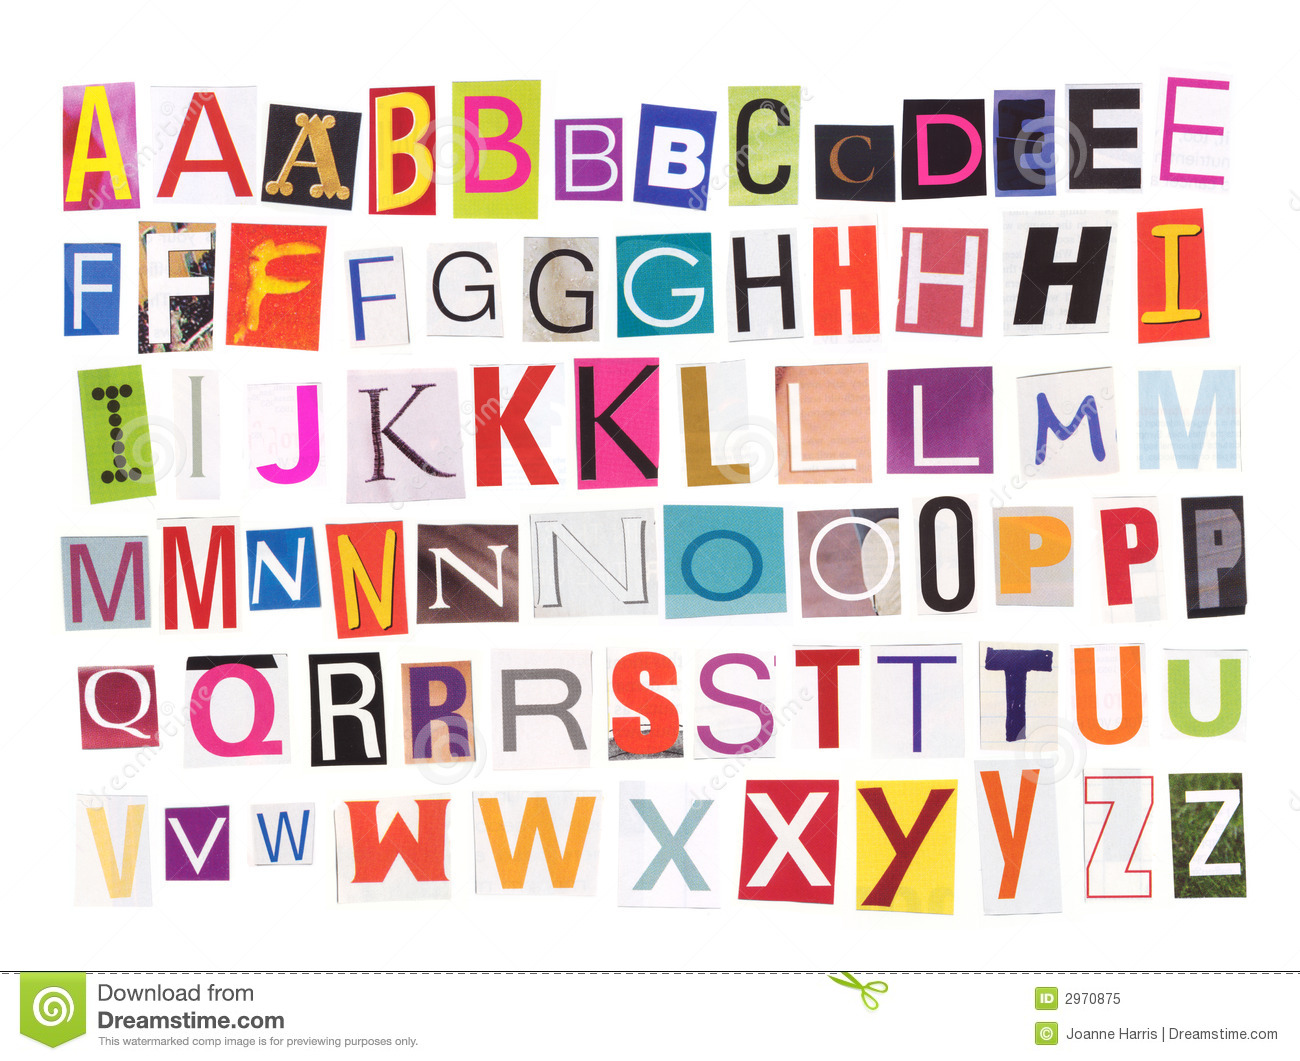 Magazine Letters Cut Out